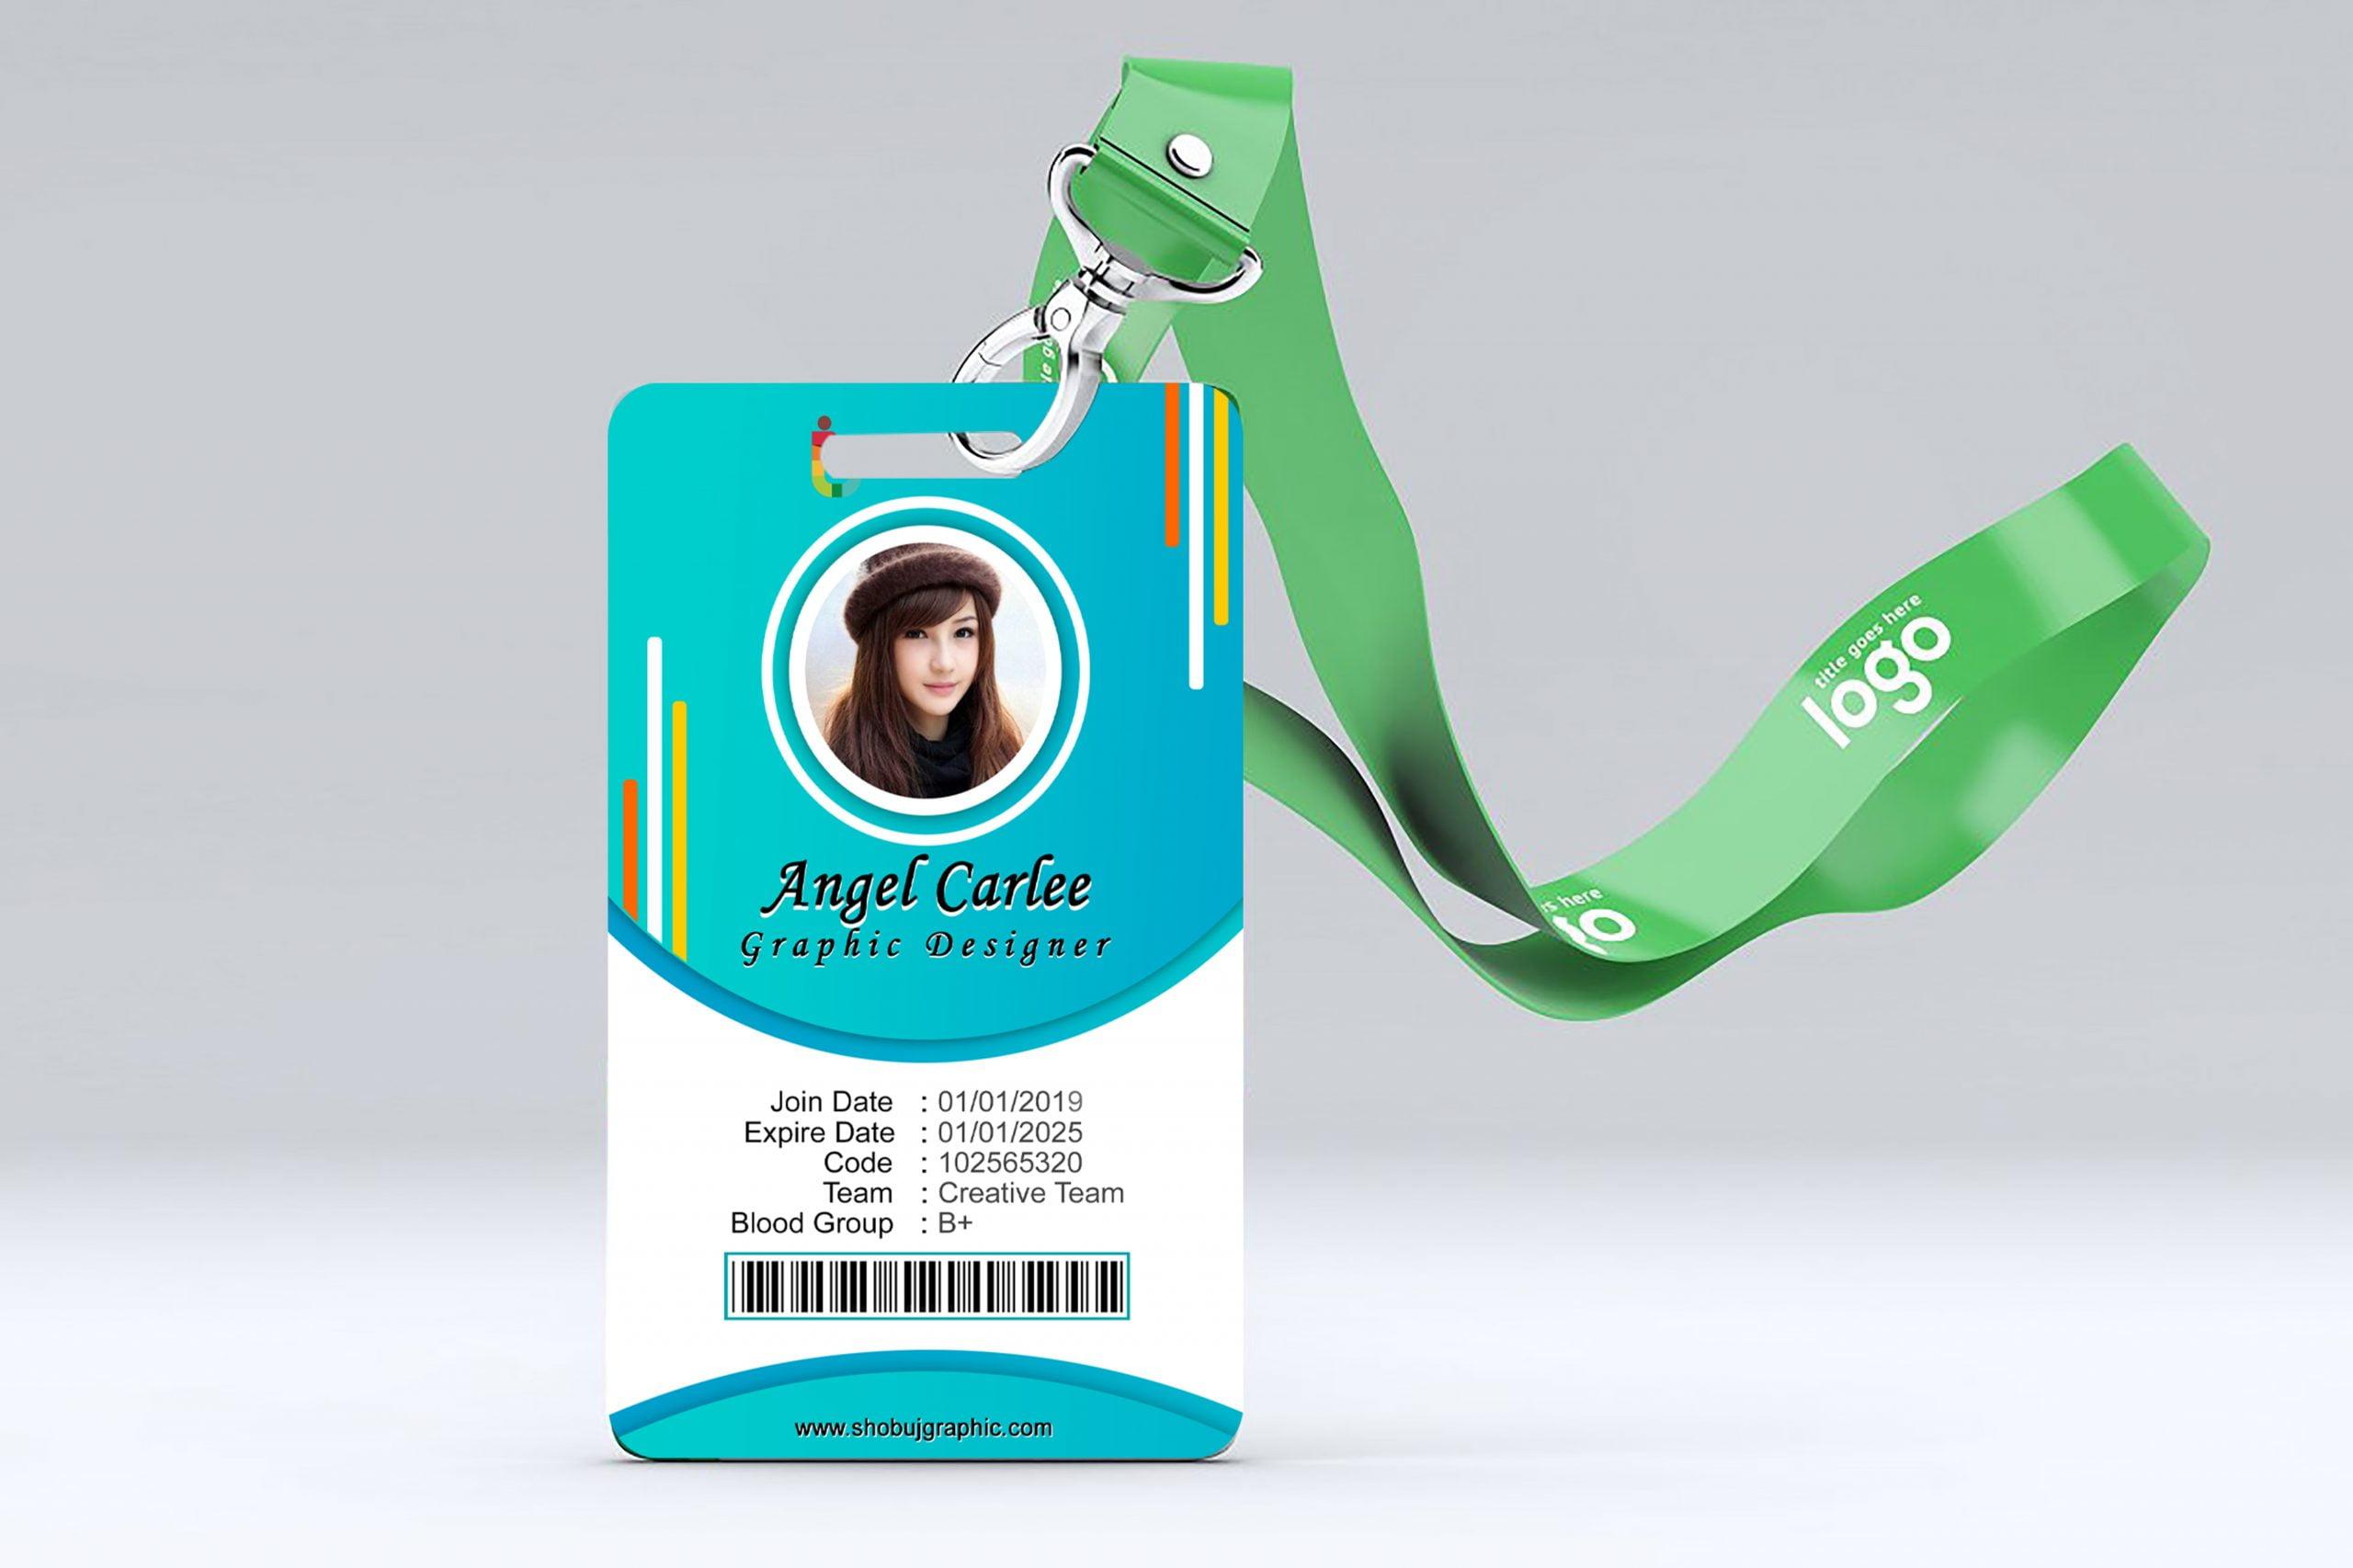 Colorful id-Card design presentation